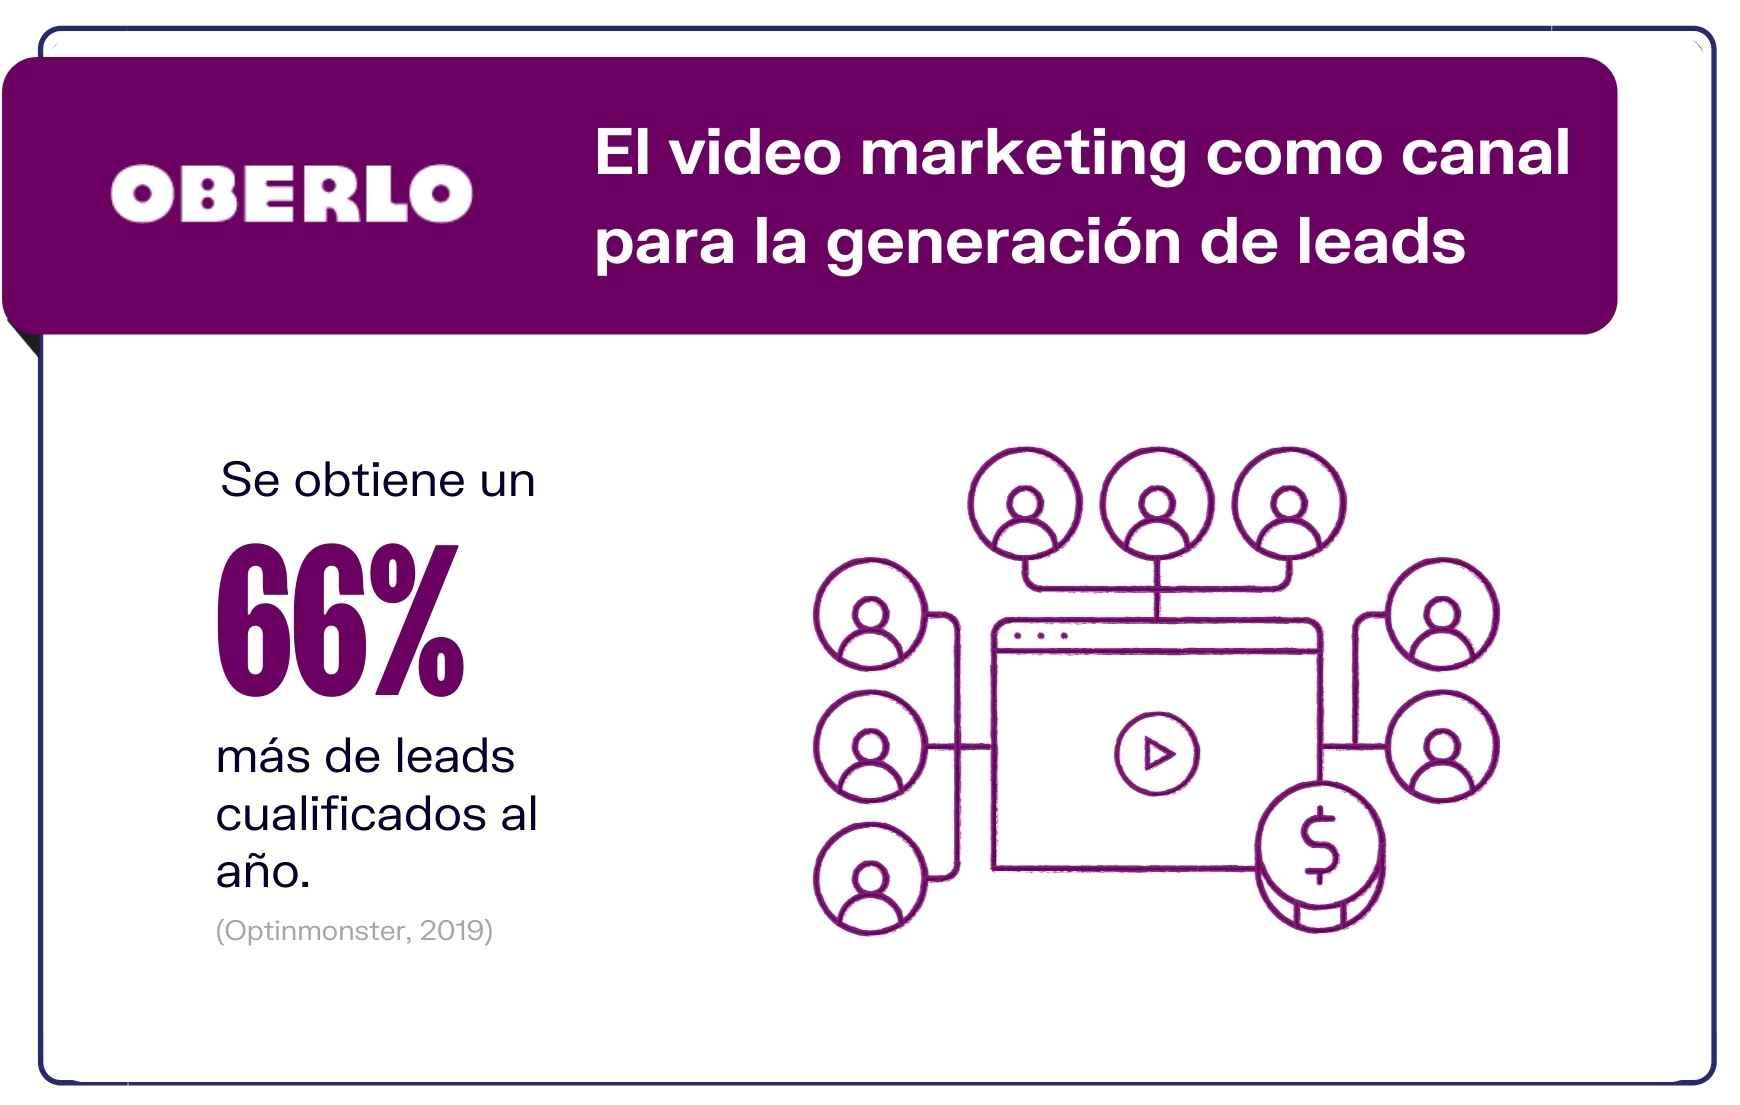 Usuarios de marketing video